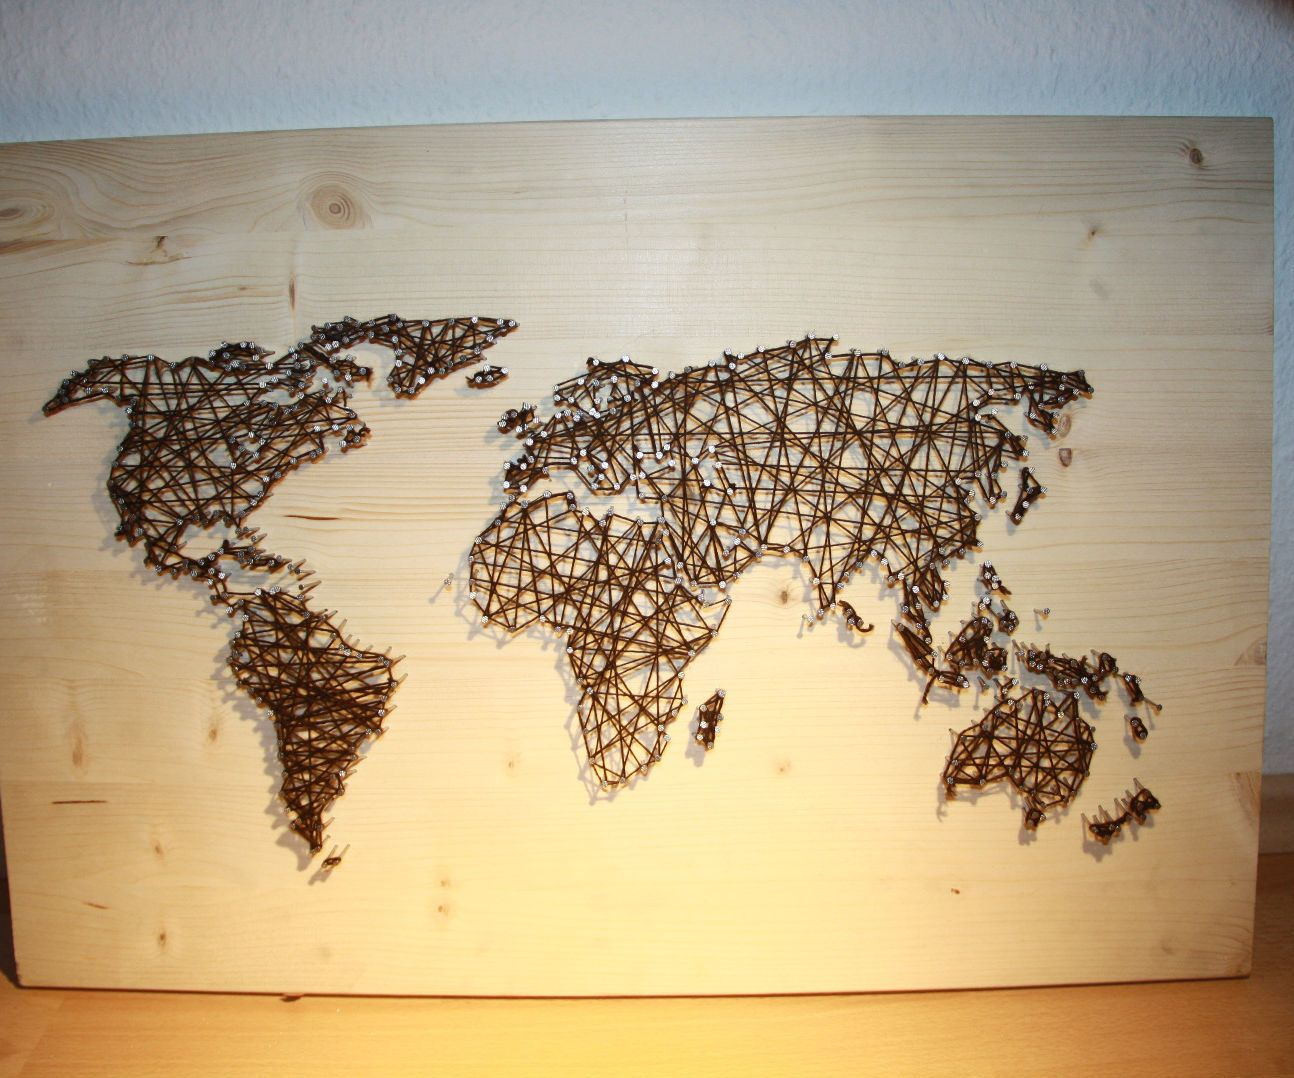 Cool Wall Hangings string and nail art `world map´ | string art and wall hangings